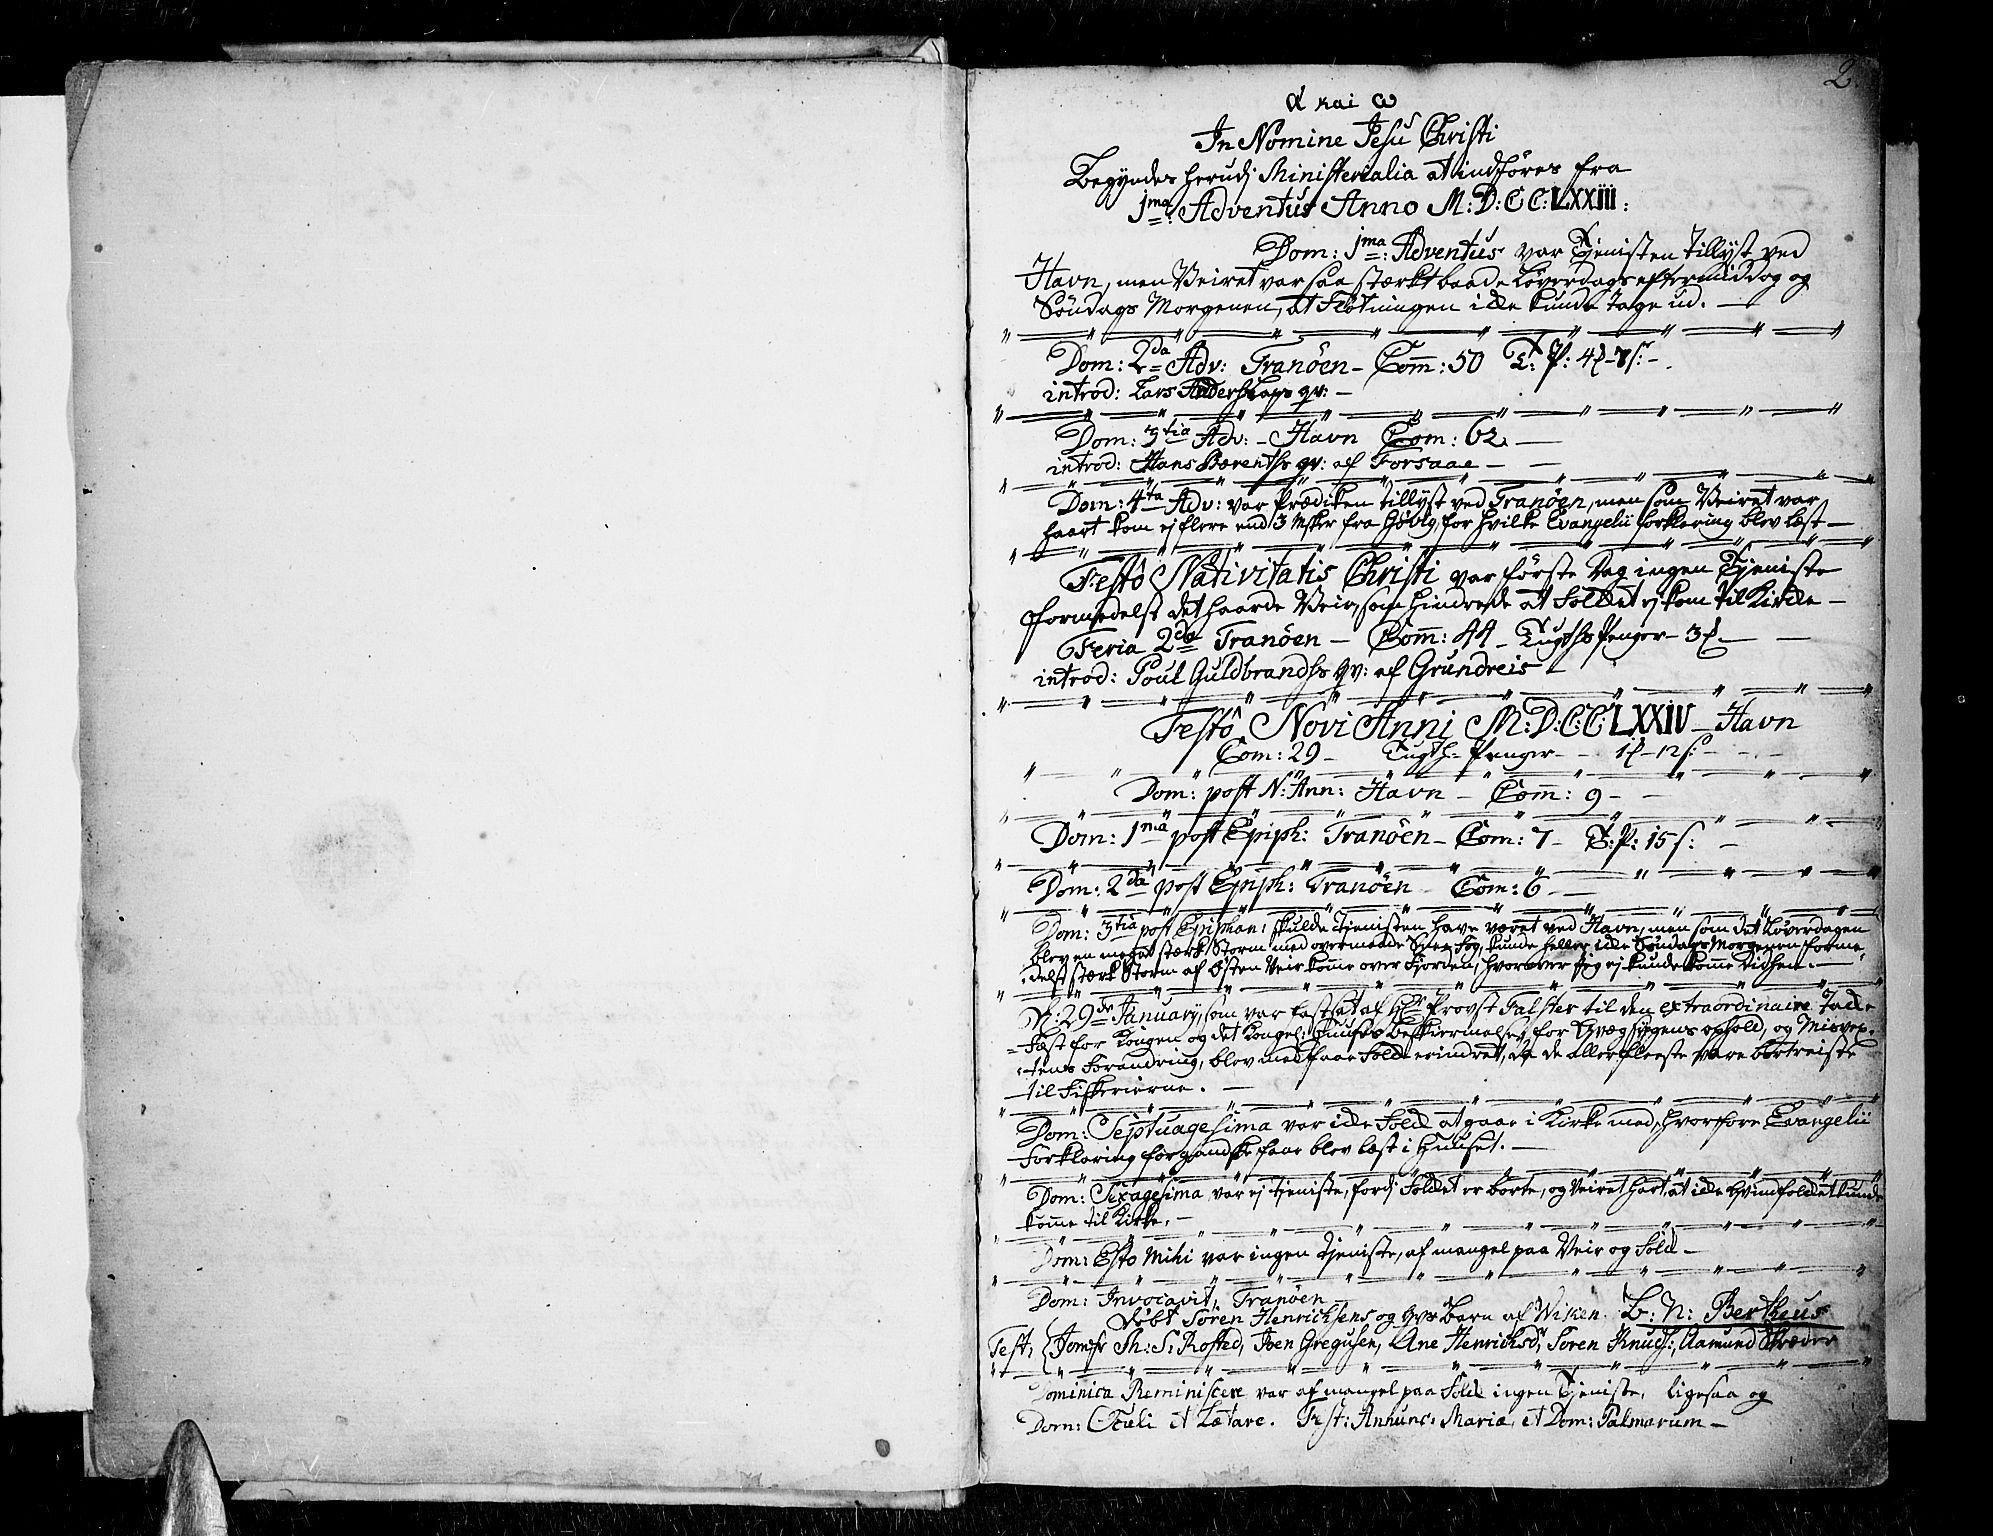 SATØ, Tranøy sokneprestkontor, I/Ia/Iaa/L0002kirke: Ministerialbok nr. 2, 1773-1806, s. 2